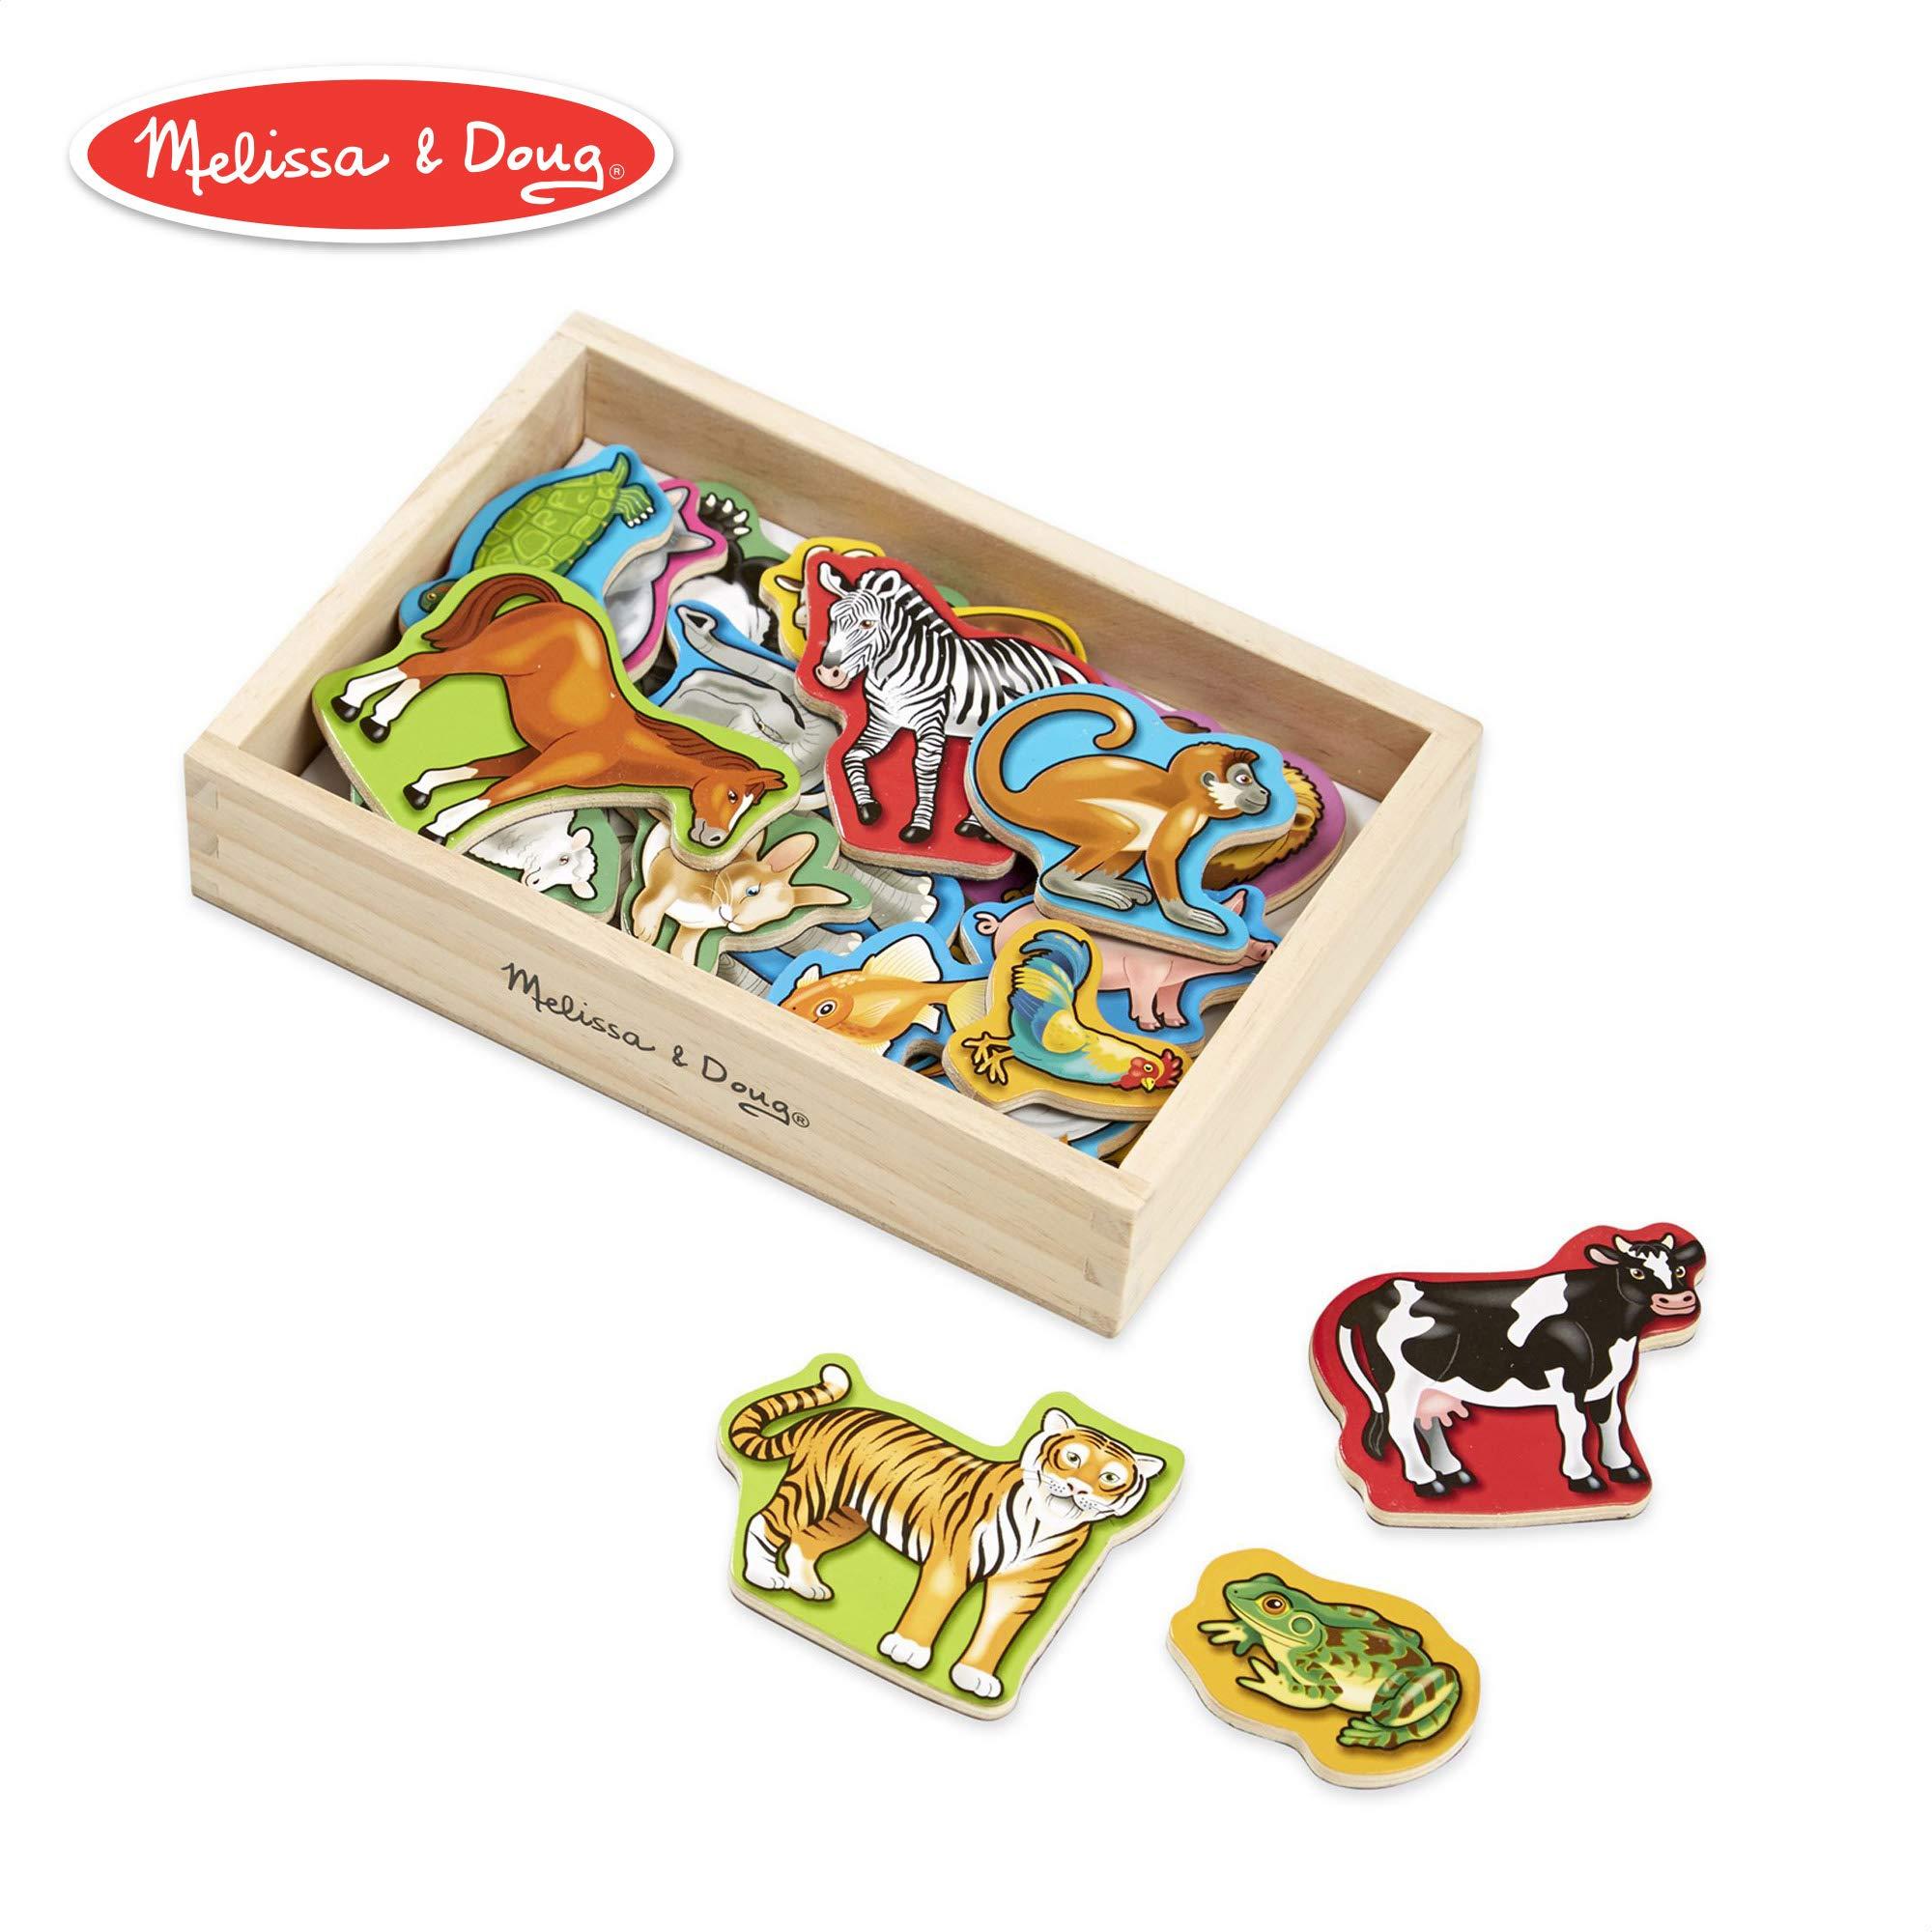 Melissa & Doug Wooden Animal Magnets (Developmental Toys, Wooden Storage Case, 20 Animal-Inspired Magnets) by Melissa & Doug